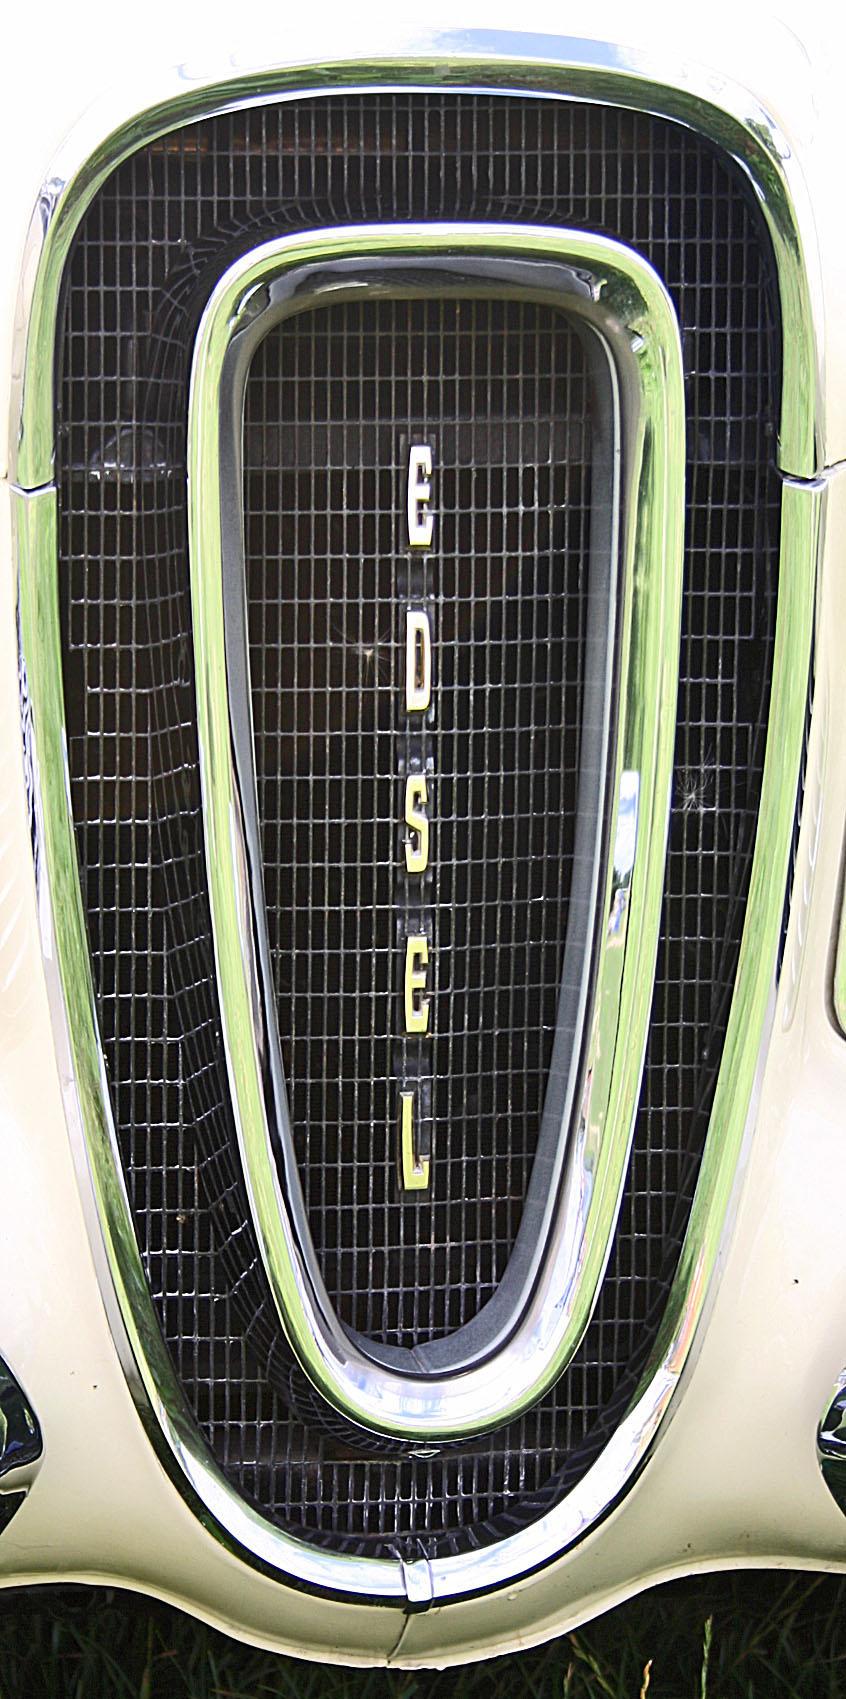 File:Edsel 1958 grille.jpg - Wikipedia